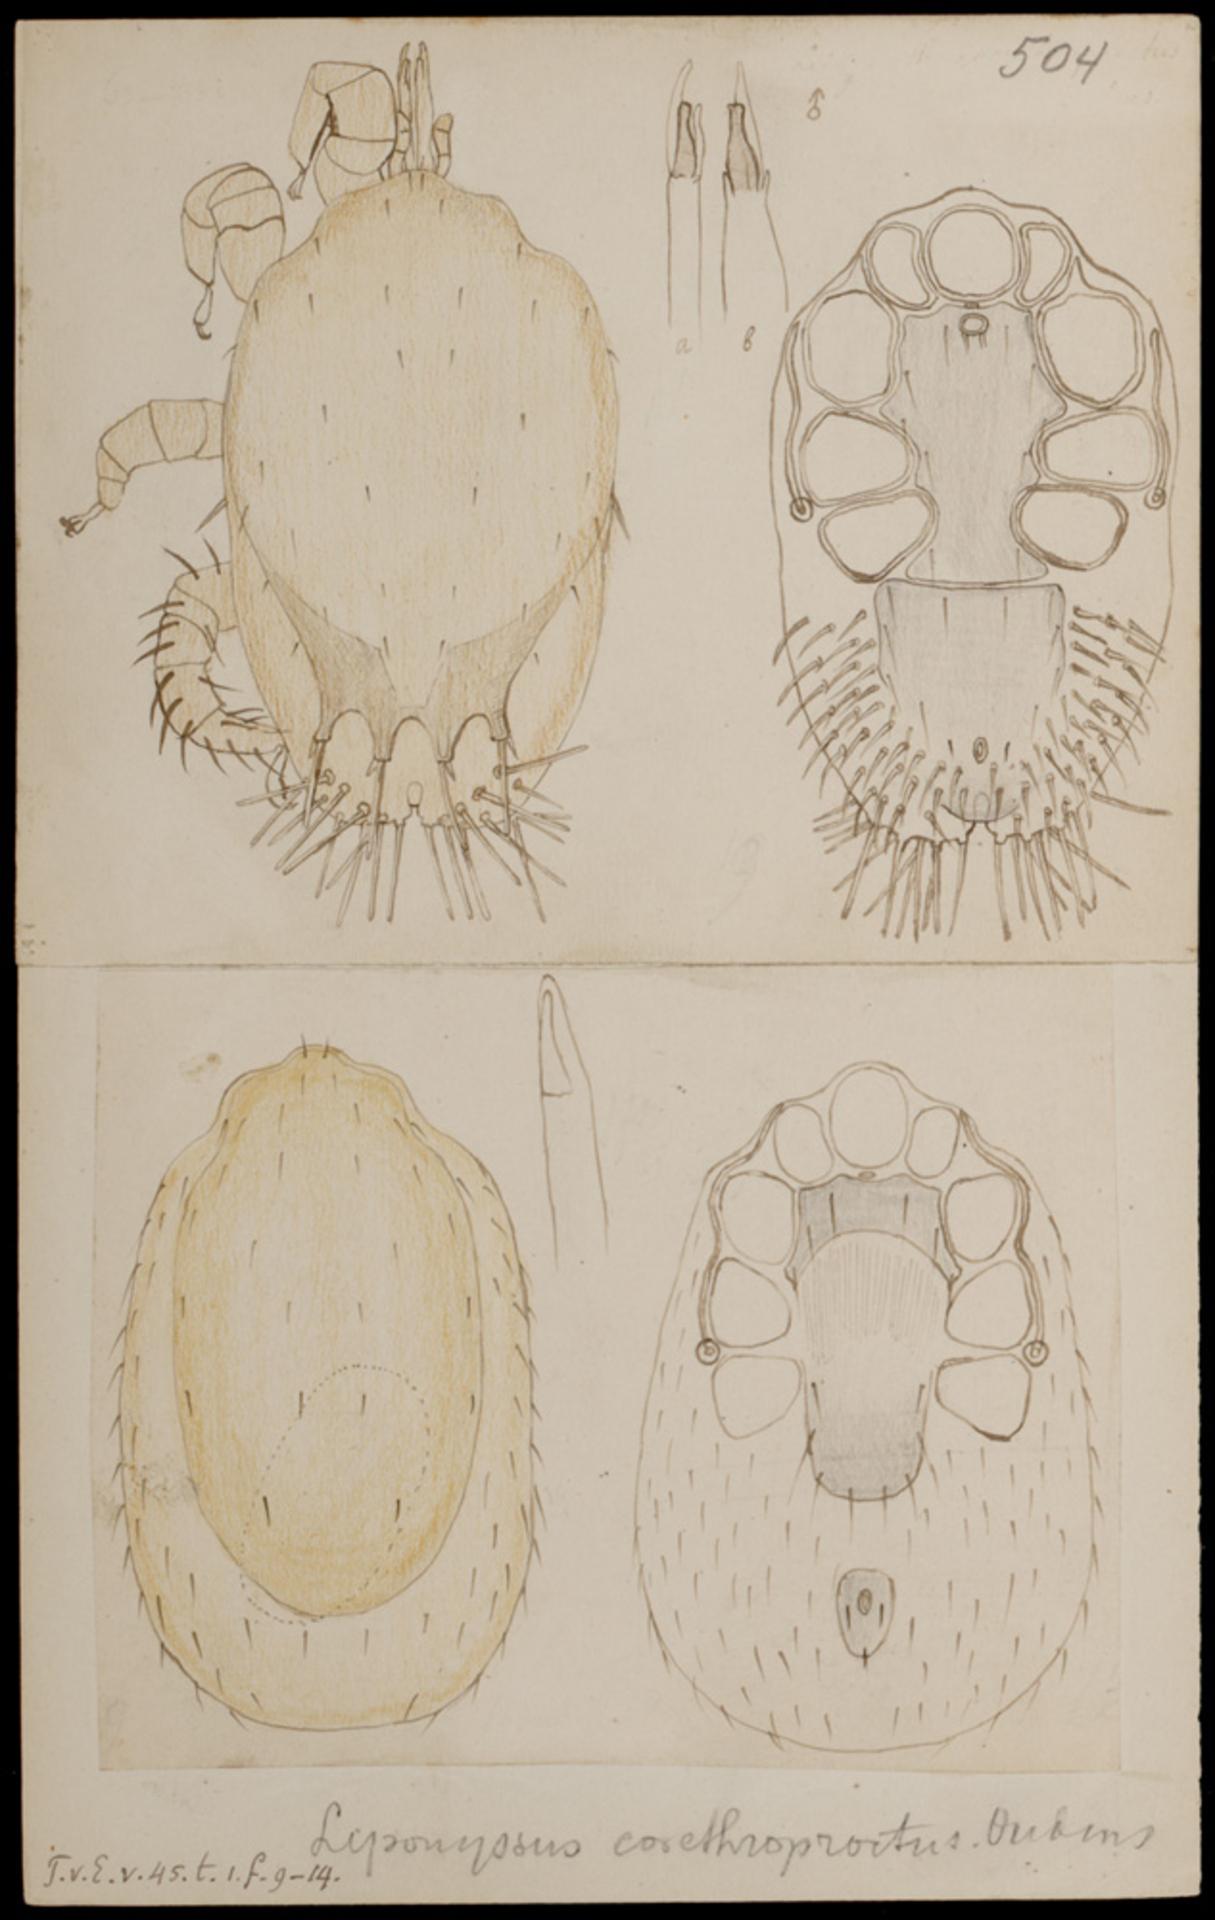 RMNH.ART.1244 | Liponyssus corethroproctus (Oudemans)